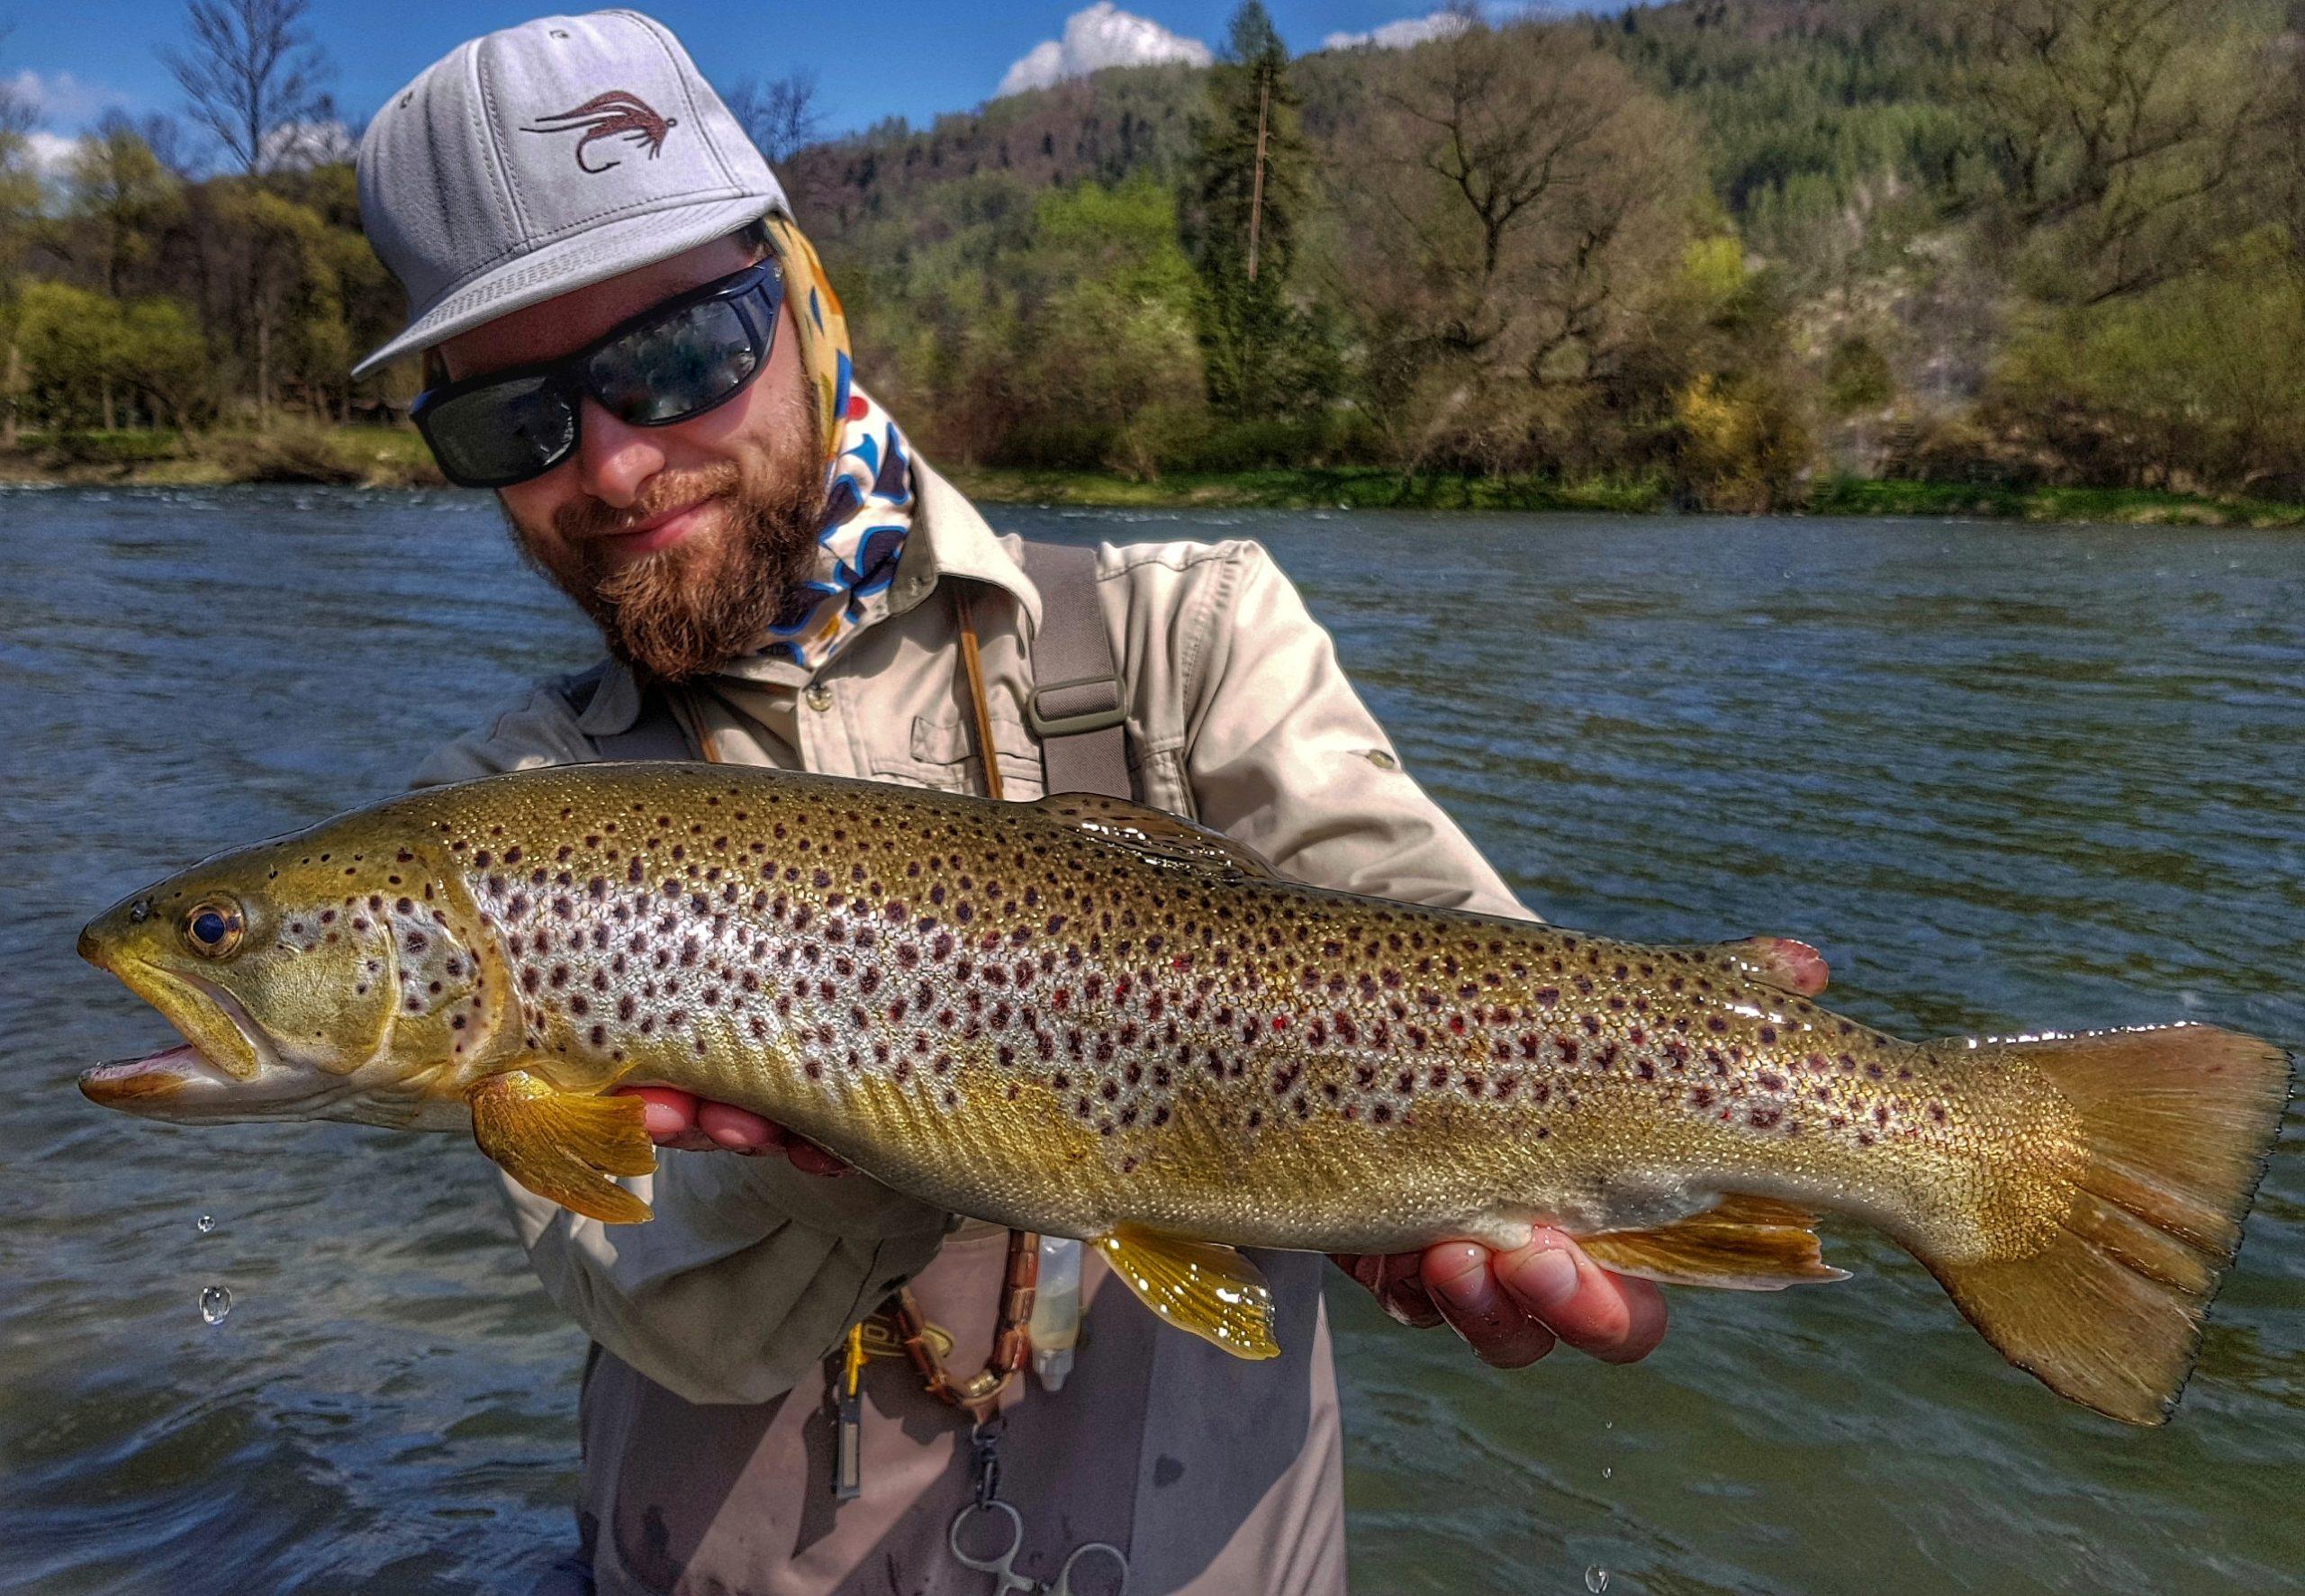 Dunajec River Brown Trouts, similar to Bosnia Una and Ribnik fishing